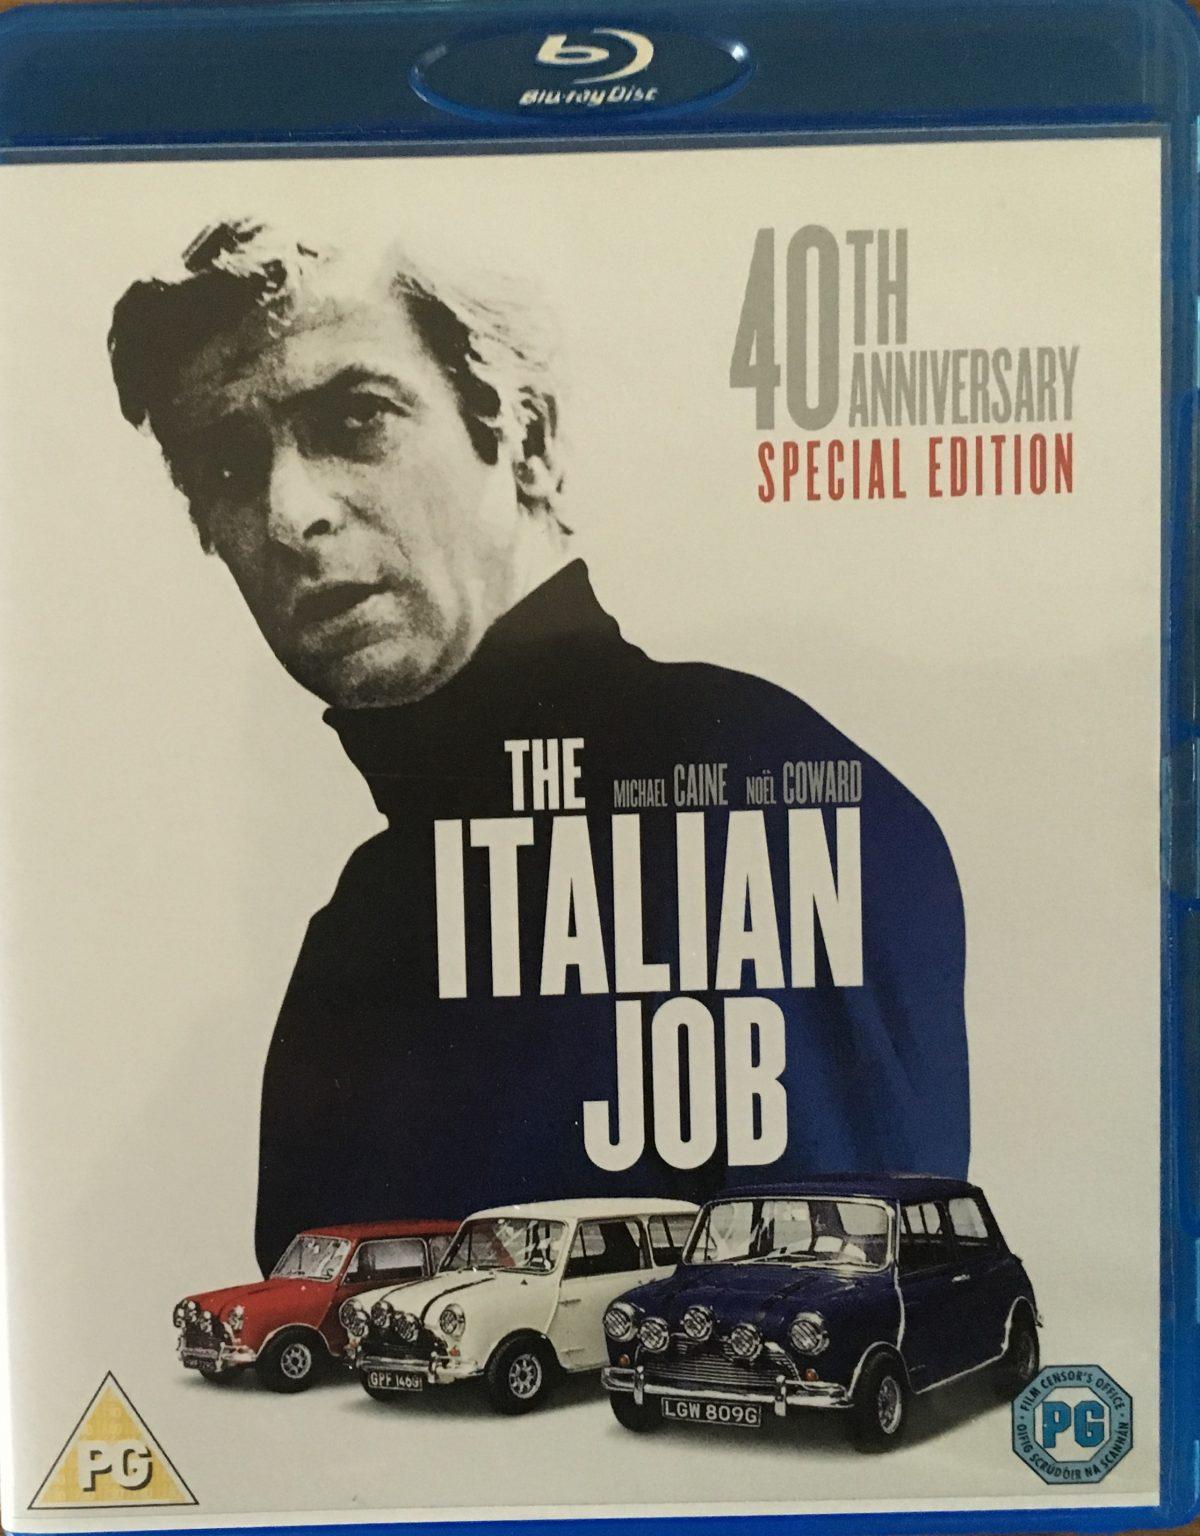 The Italian Job at National Mini Day